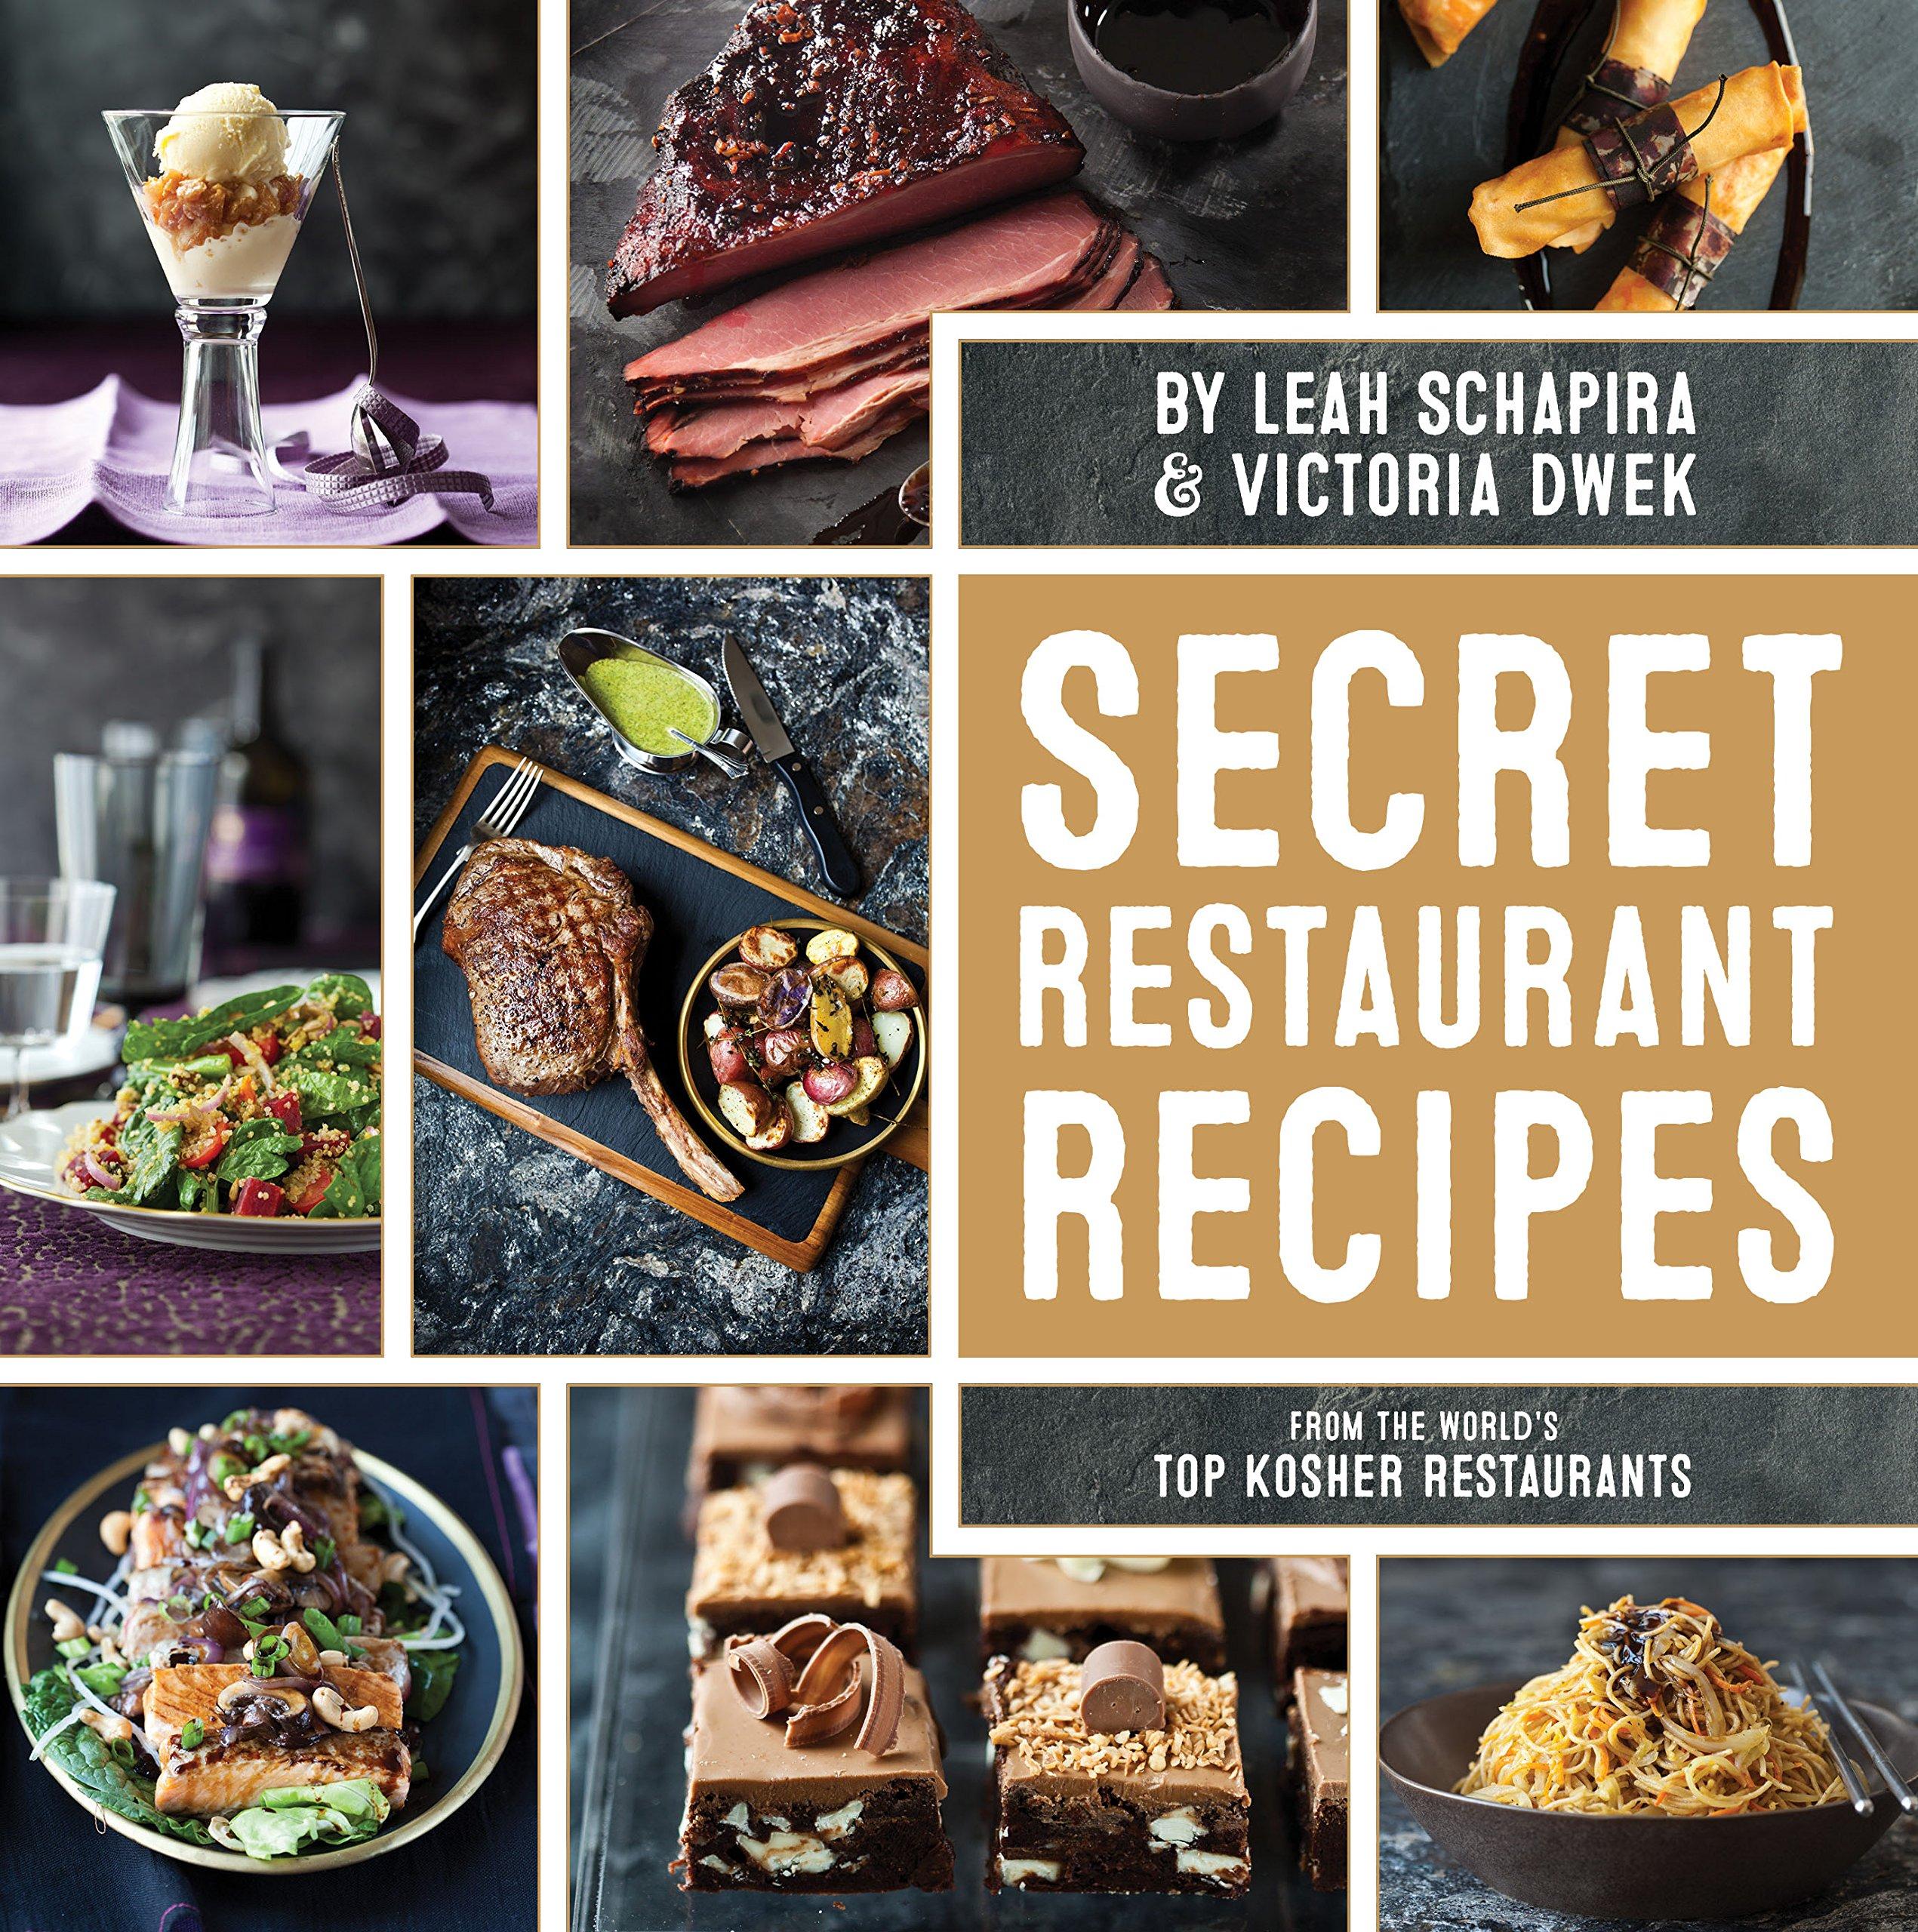 Secret Restaurant Recipes From The World S Top Kosher Restaurants Leah Schapira Victoria Dwek 9781422615287 Amazon Com Books